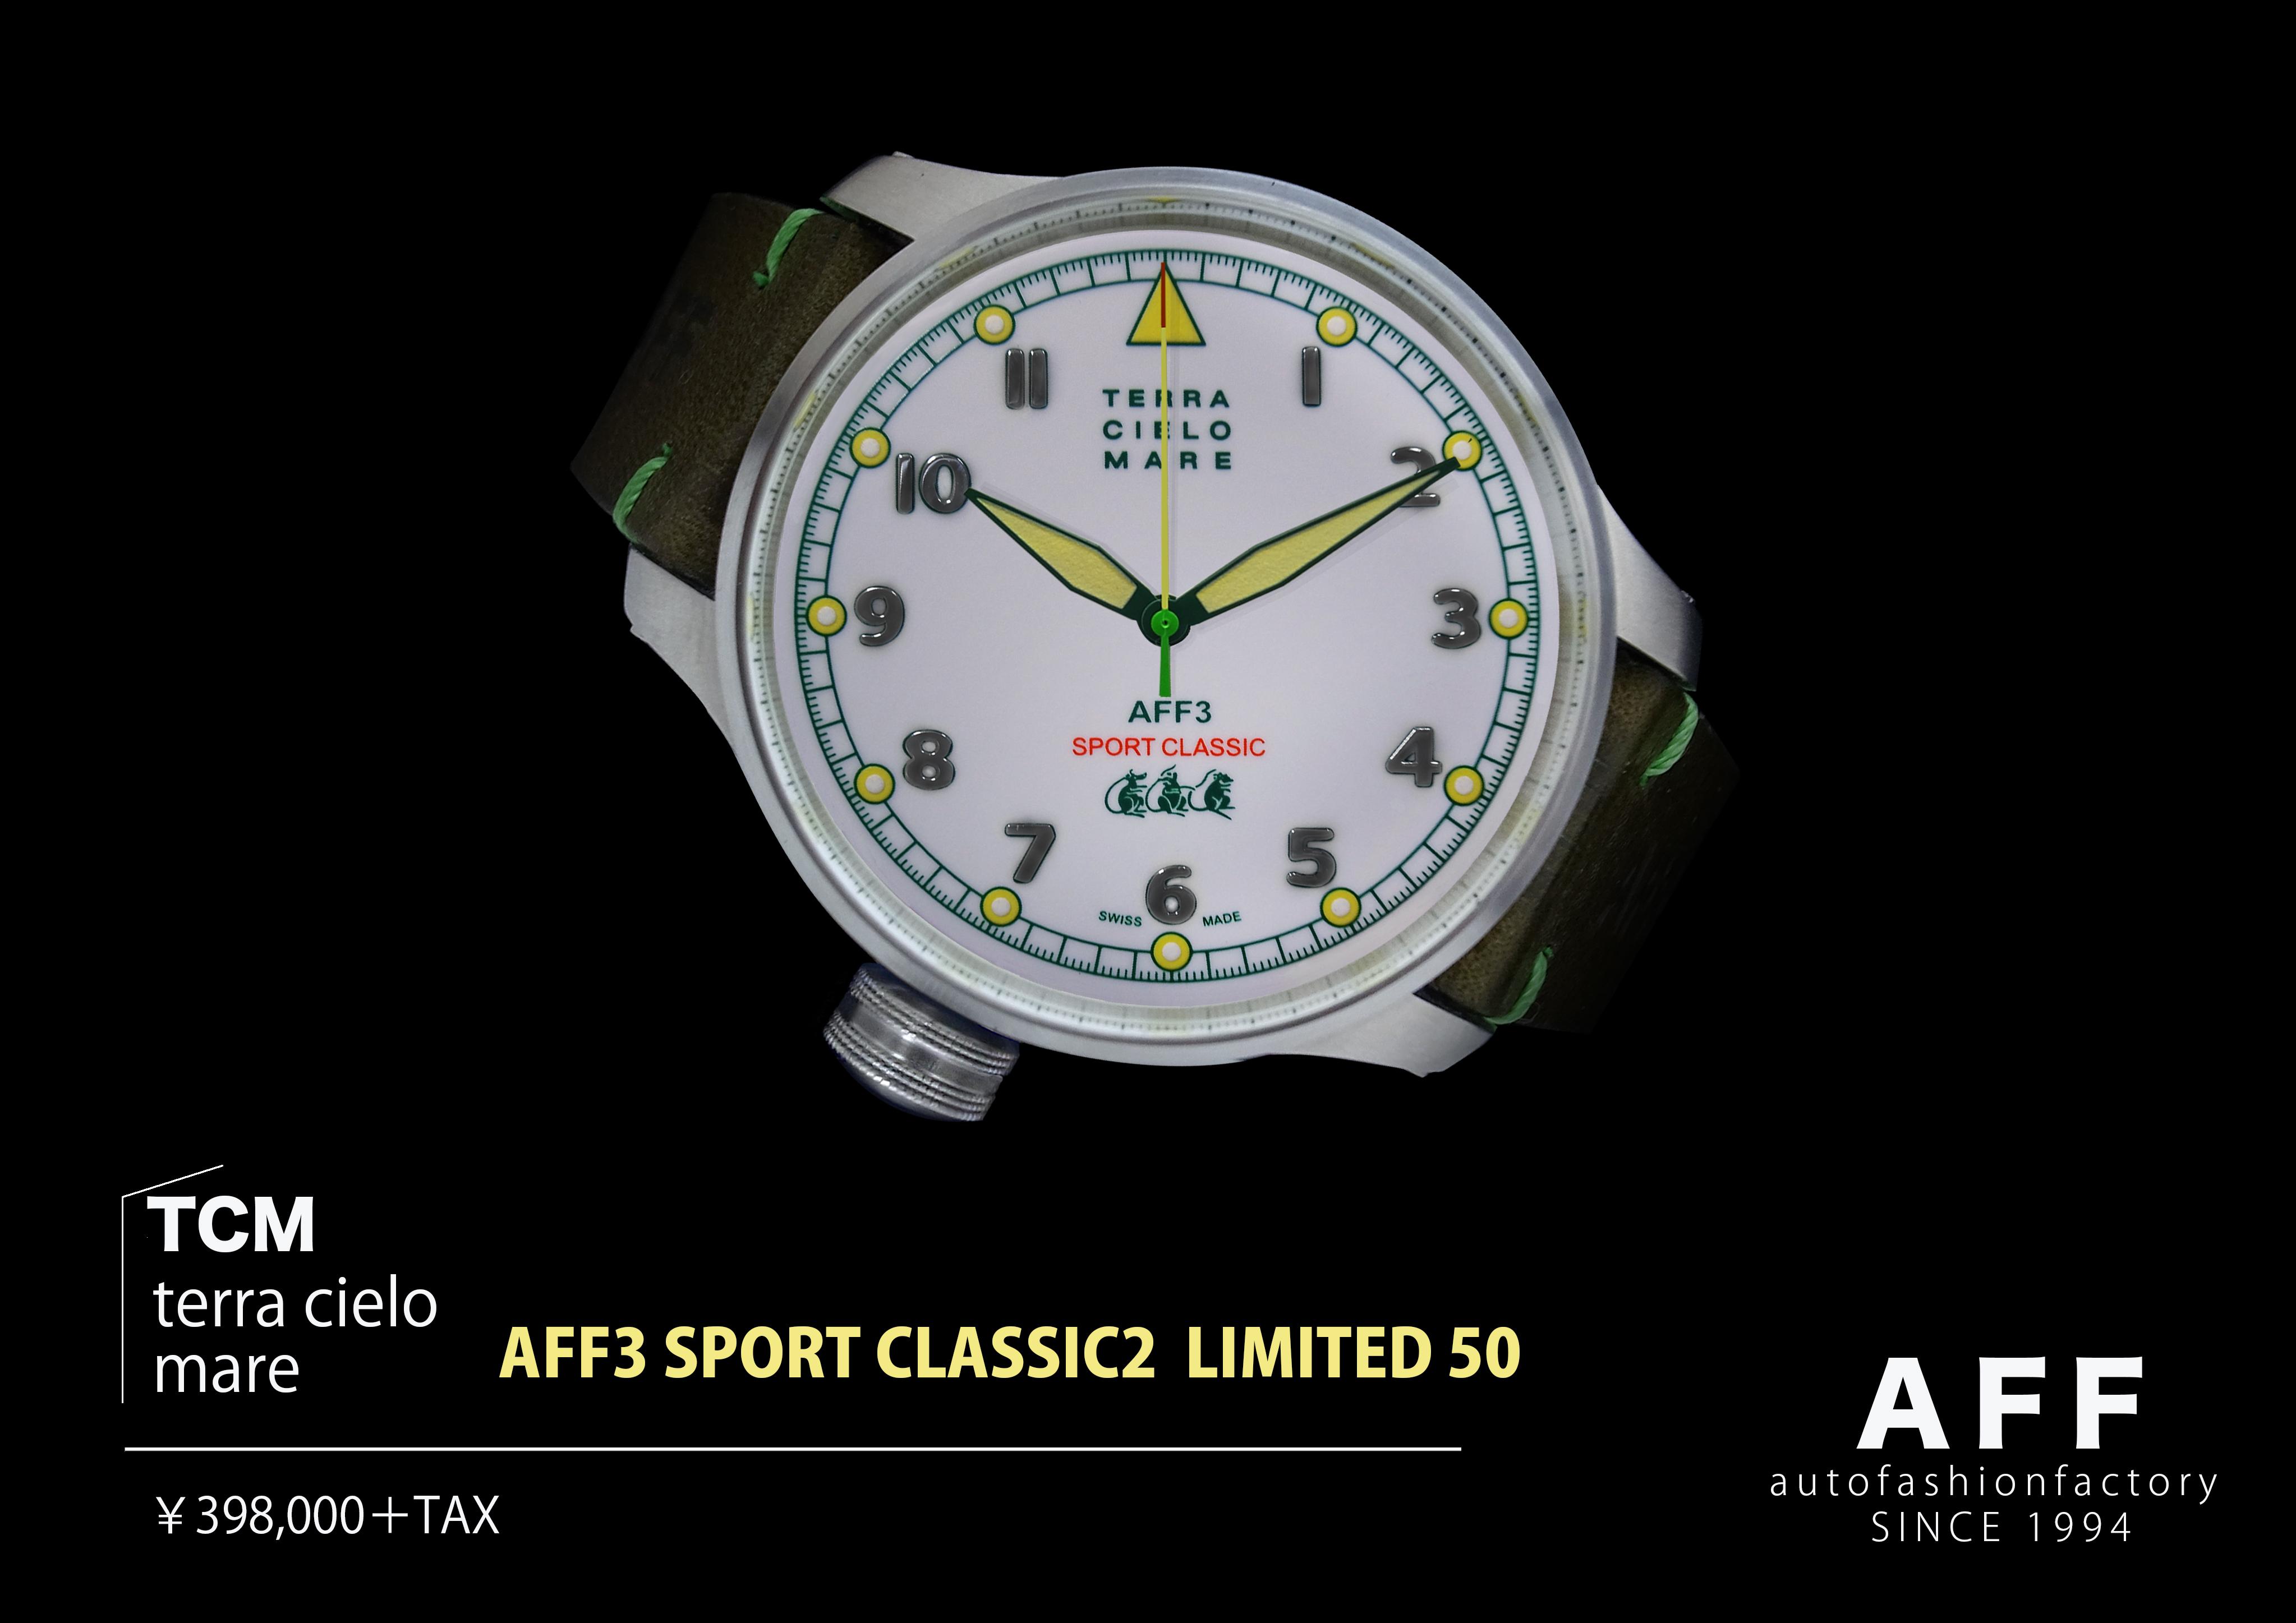 AFF3 SPORT CLASSIC2